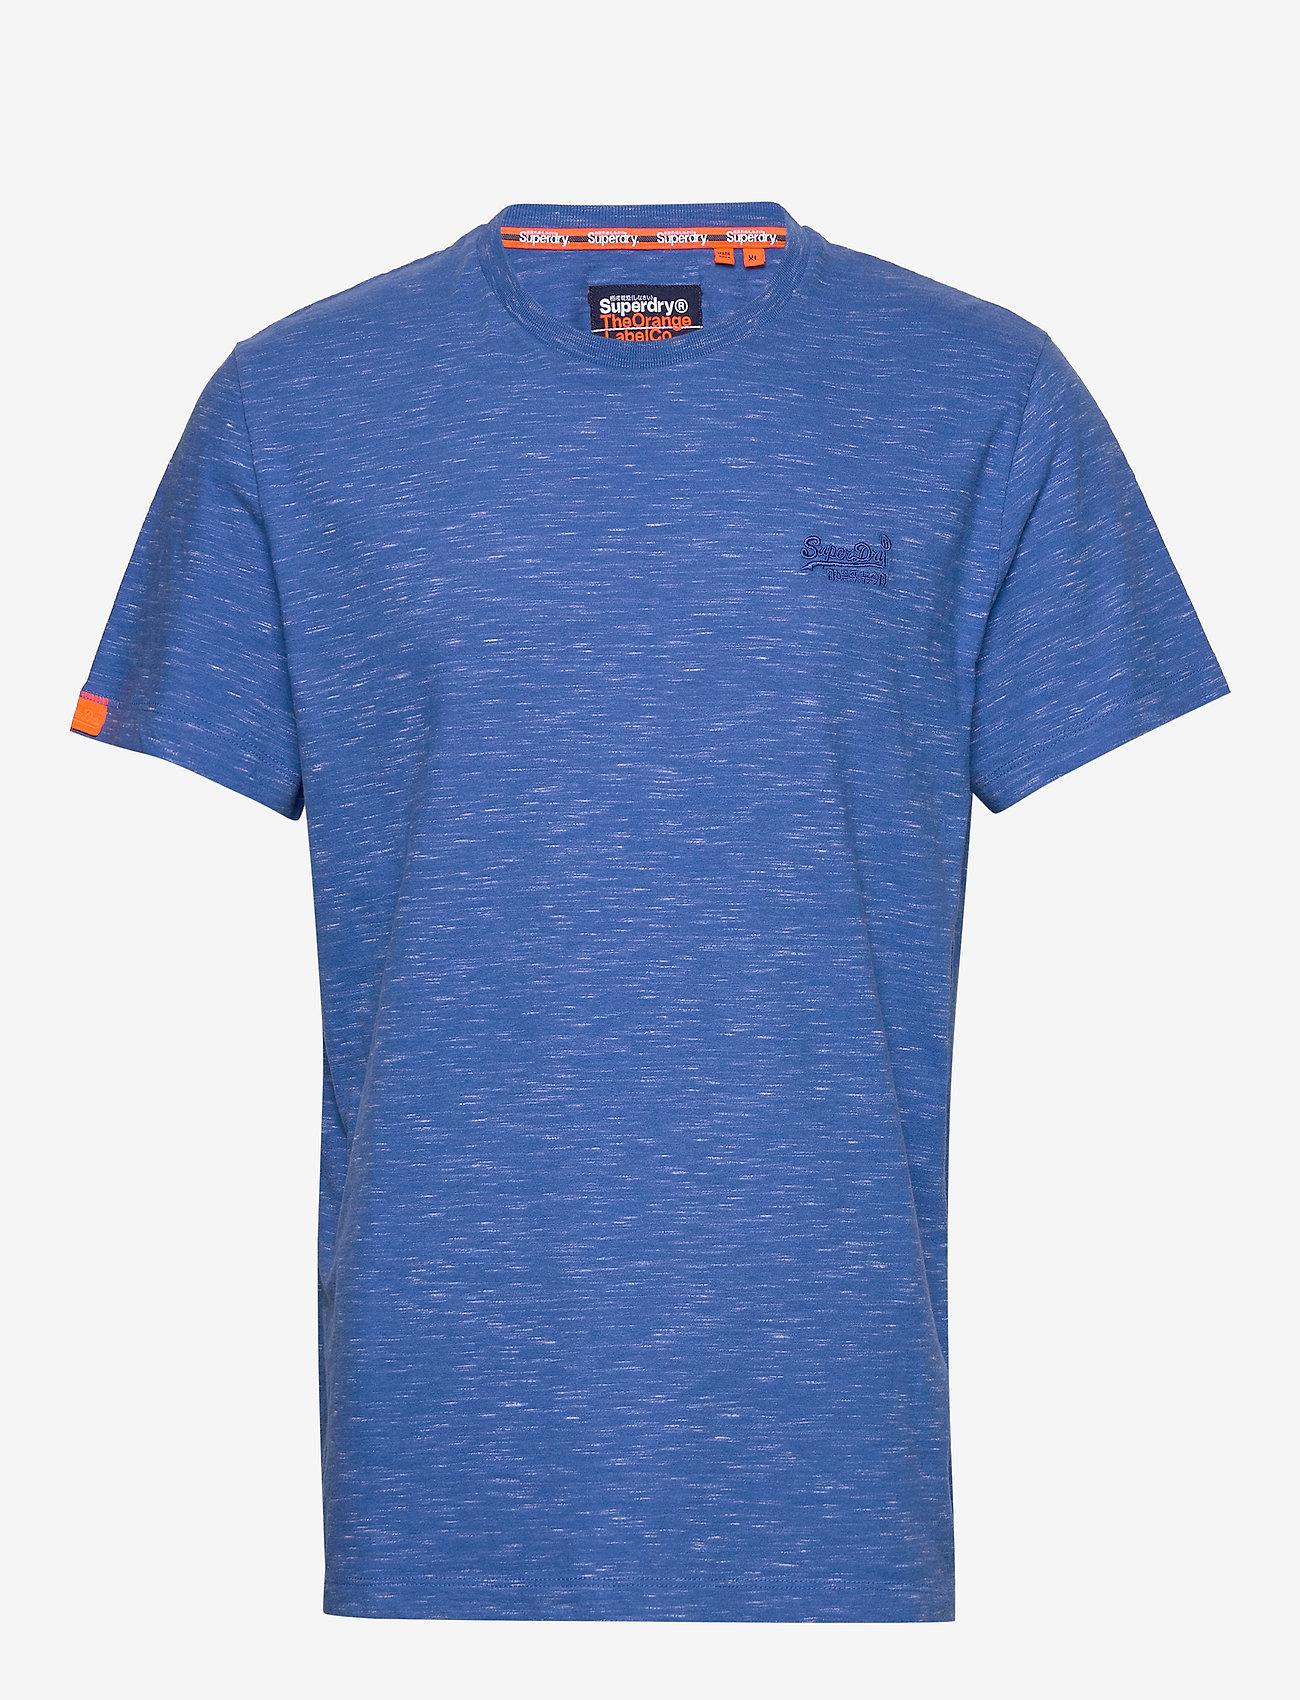 Superdry OL VINTAGE EMB CREW - T-shirts COBALT SPACE DYE f2KBjdCE